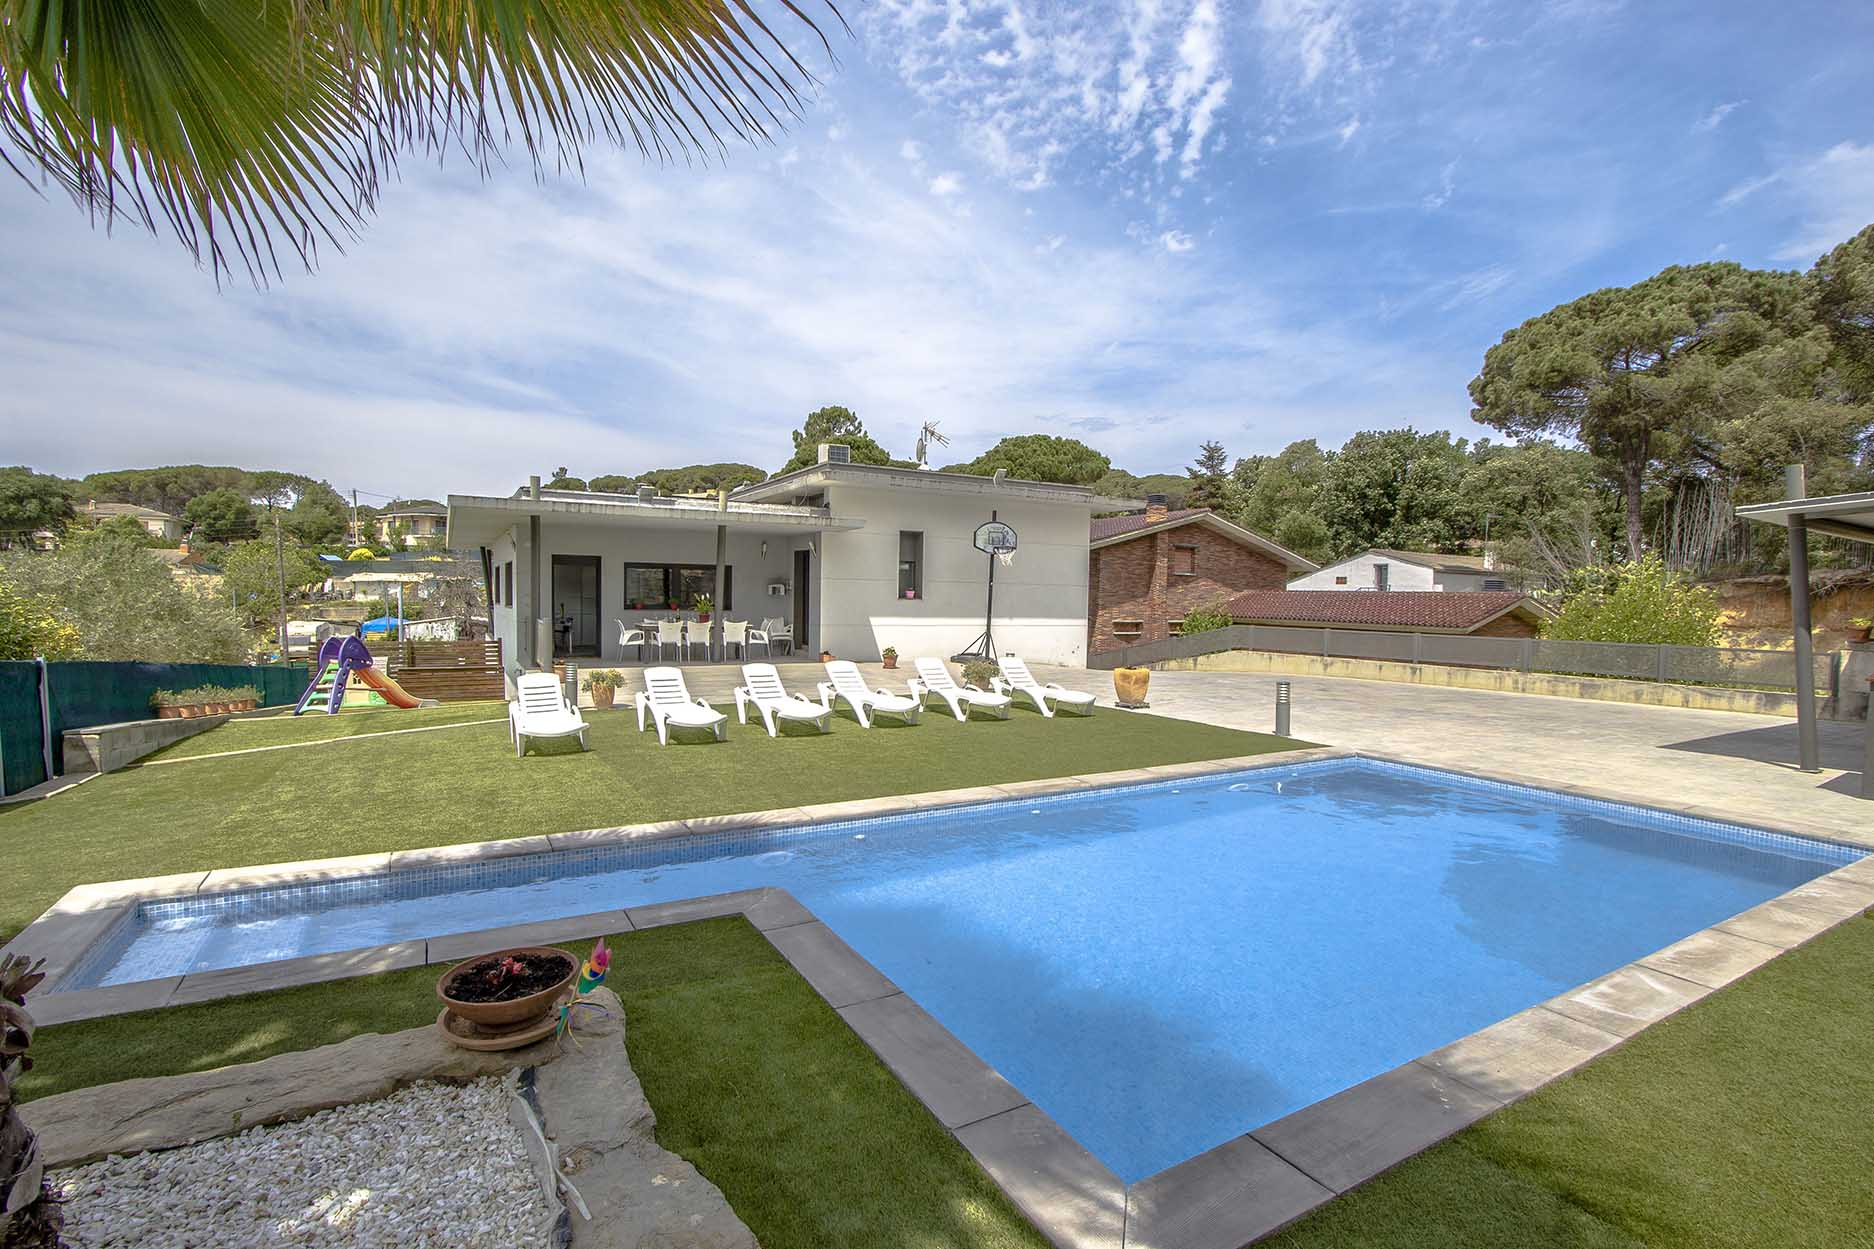 Ferienhaus Catalunya Casas: Modern villa in Sils, 15 min drive to Costa Brava beaches! (1902227), Les Mallorquines, Girona, Katalonien, Spanien, Bild 1